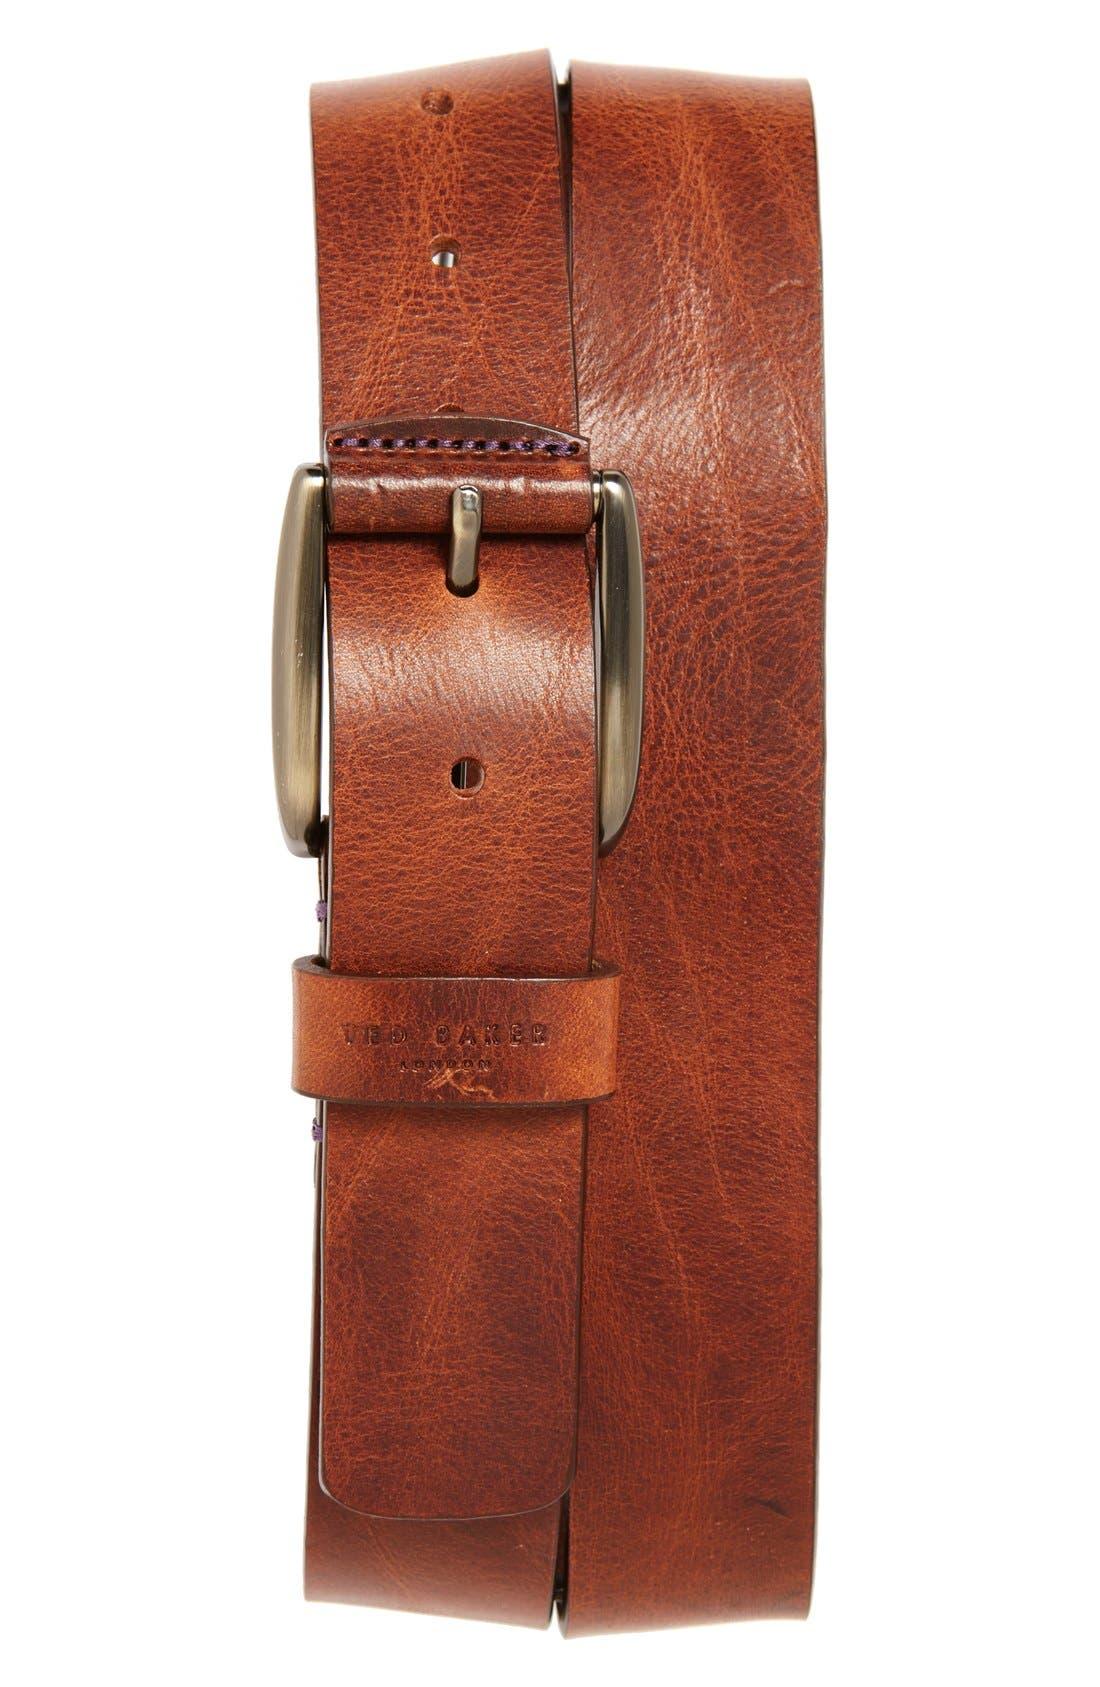 TED BAKER LONDON 'Jean' Leather Belt, Main, color, TAN